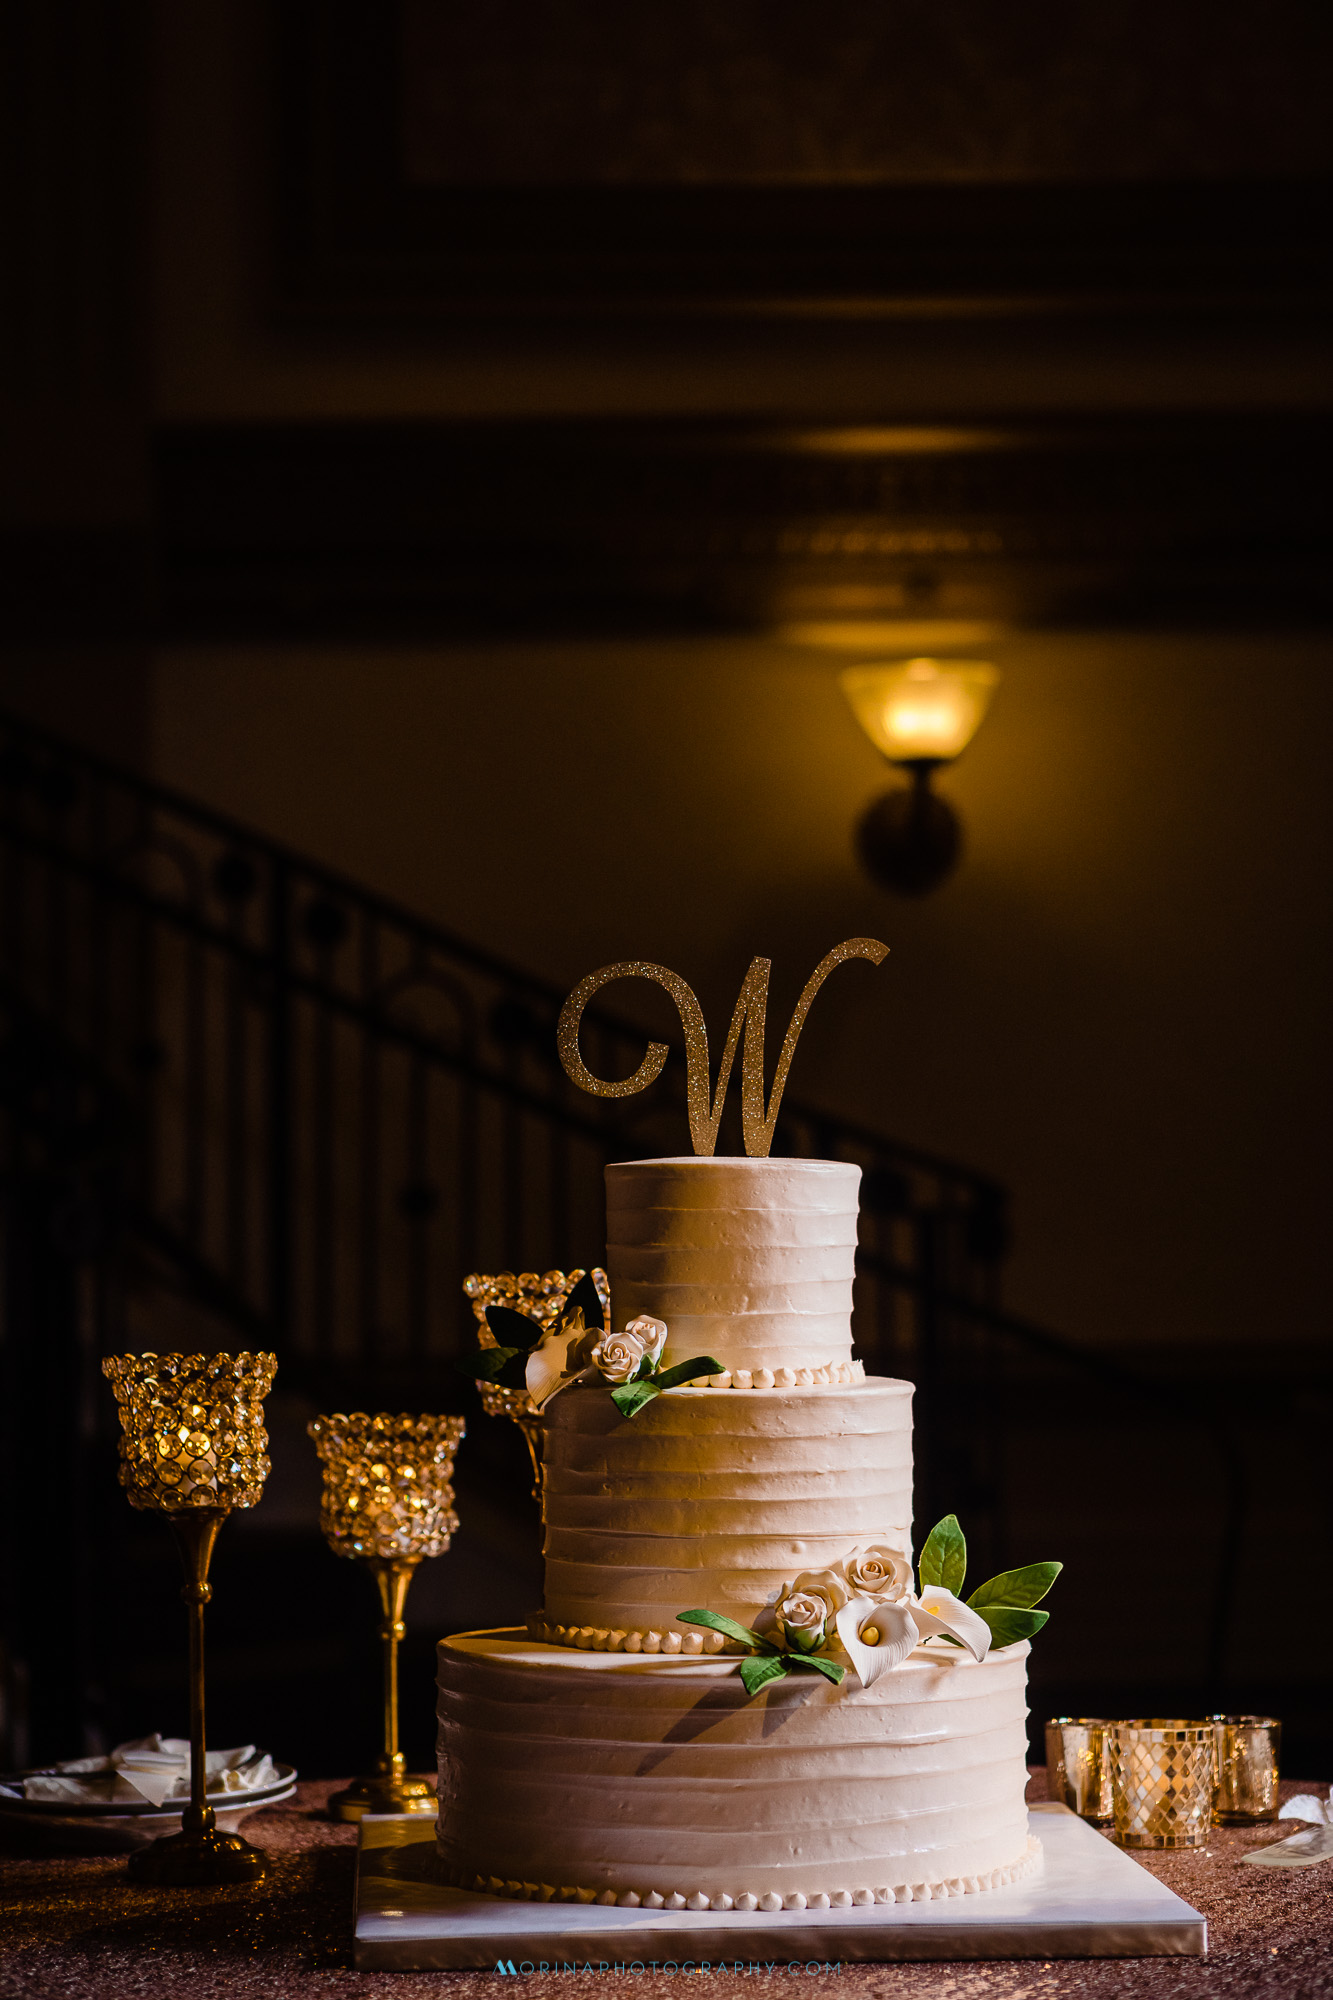 Ilhana & Jonathan Wedding at Vault 634 - Allentown 0058.jpg